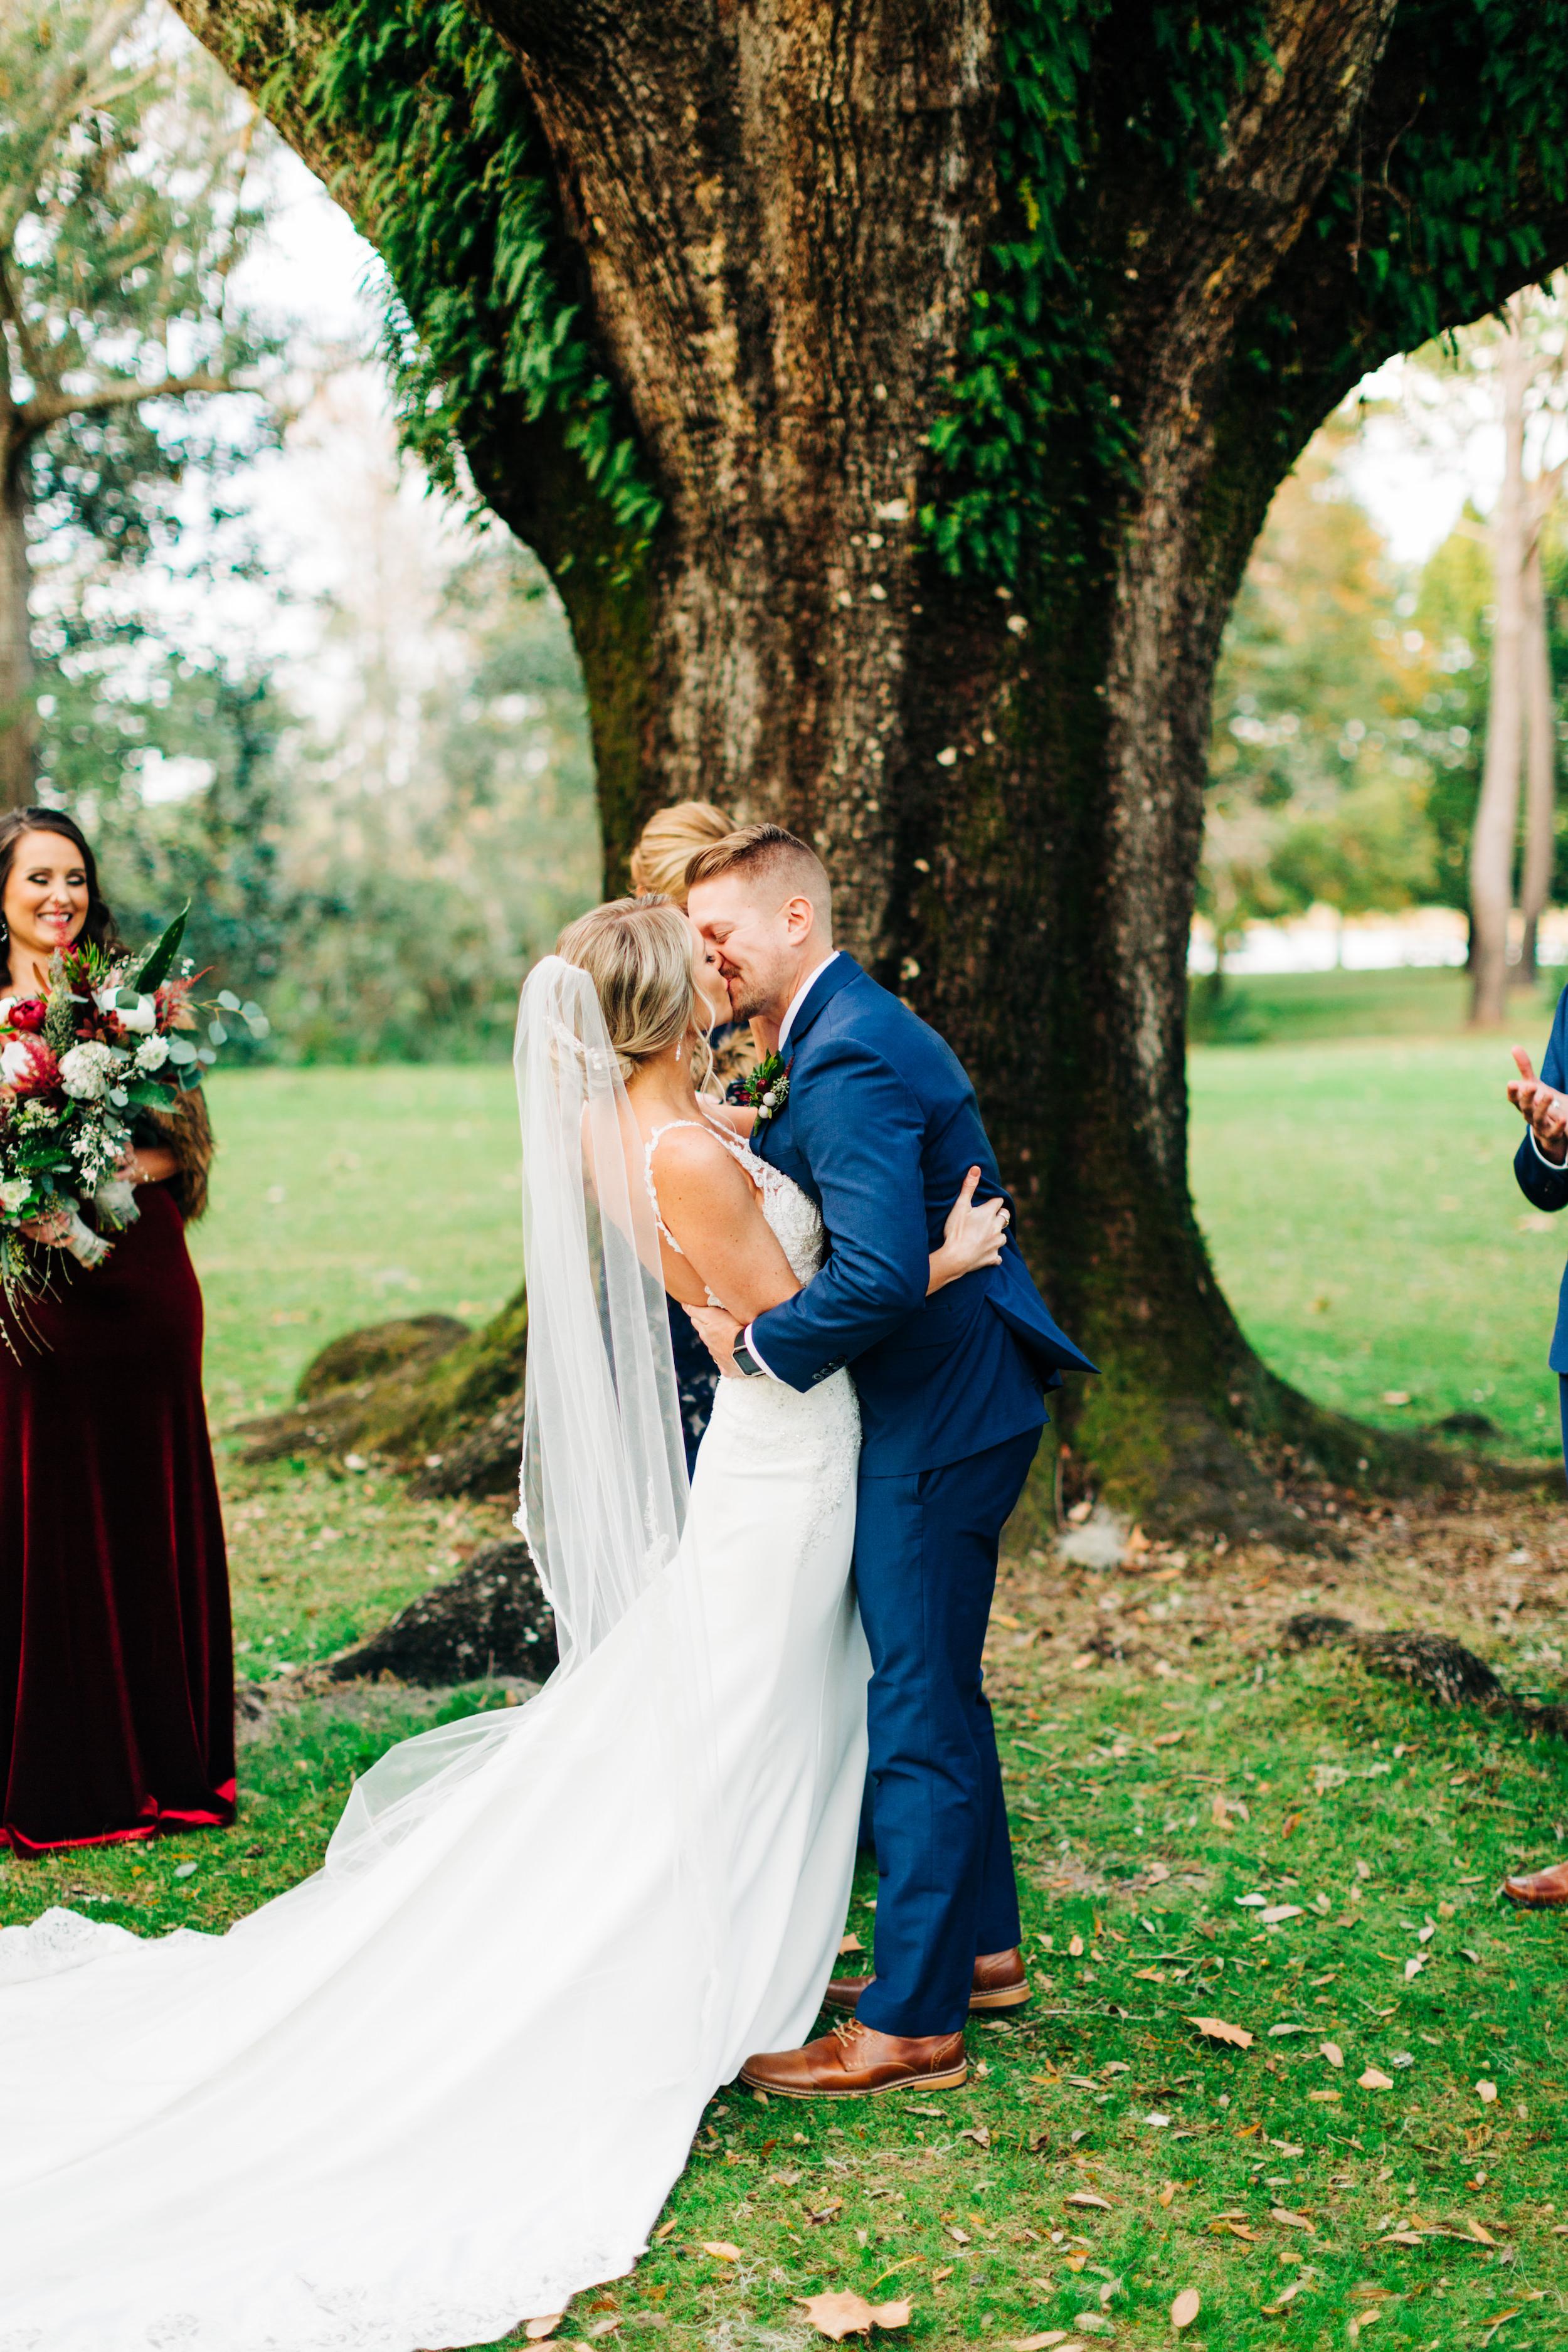 Ricky & Brittney - Ceremony - Jake & Katie Photography_152.jpg